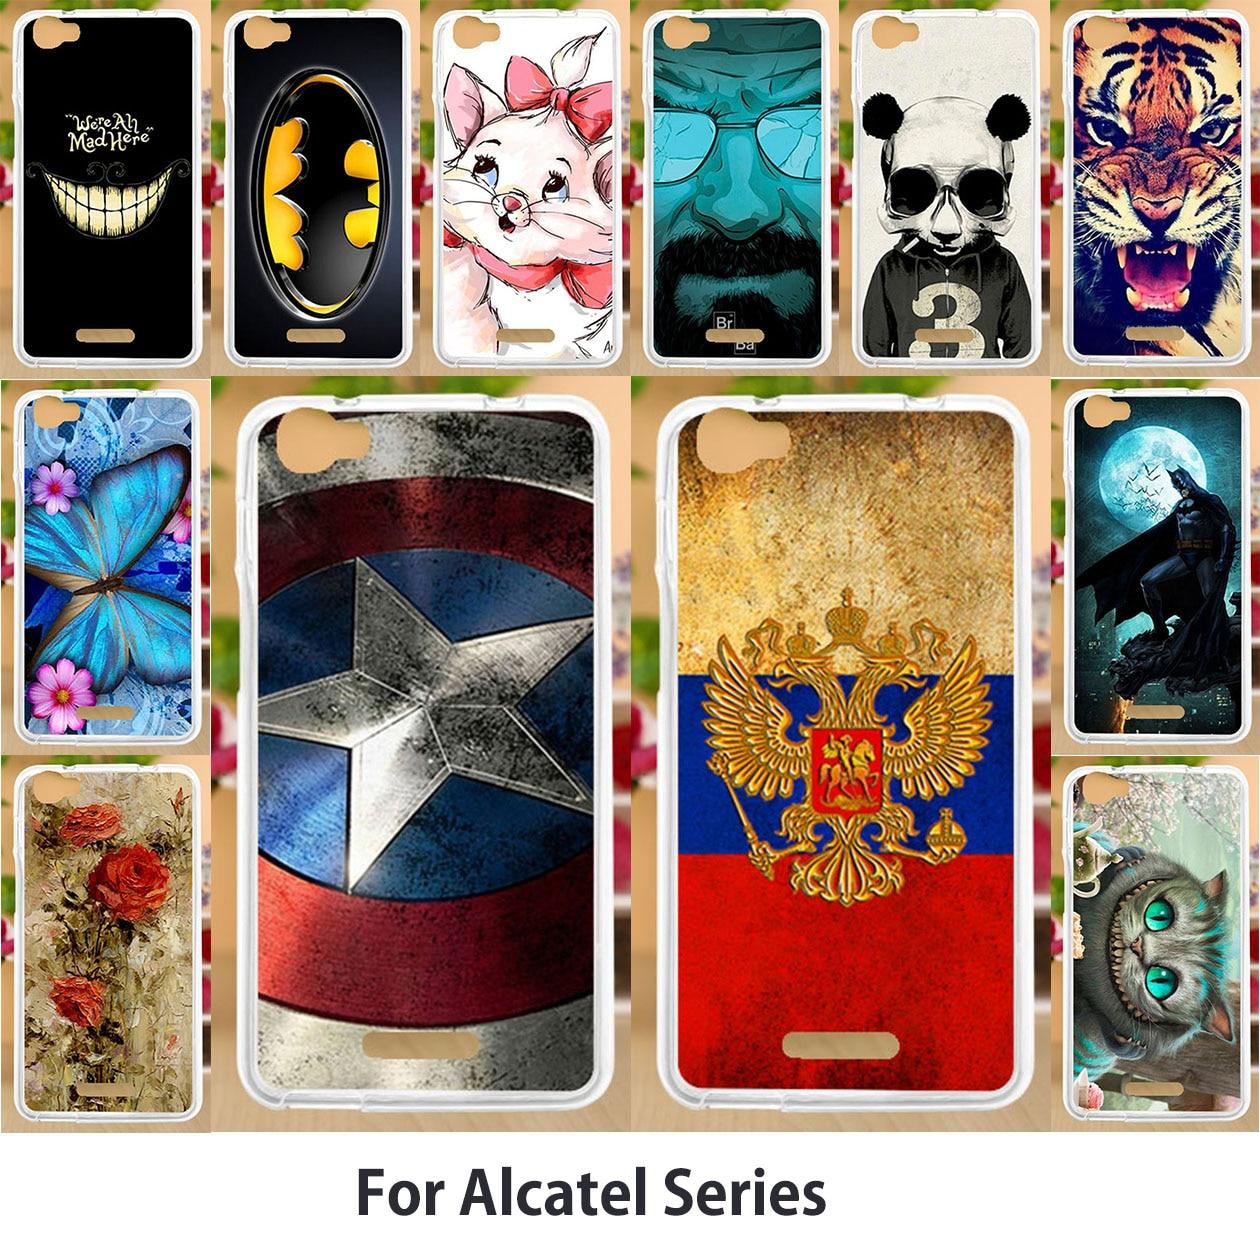 Anunob Case For Alcatel U5 3G 4047 4047D 4047Y Cover 3C U5 U3 A3 A5 A7 XL Shine Lite 1C 1X 3X  A2 A3 XL C5 C7 4G GO Play 5047